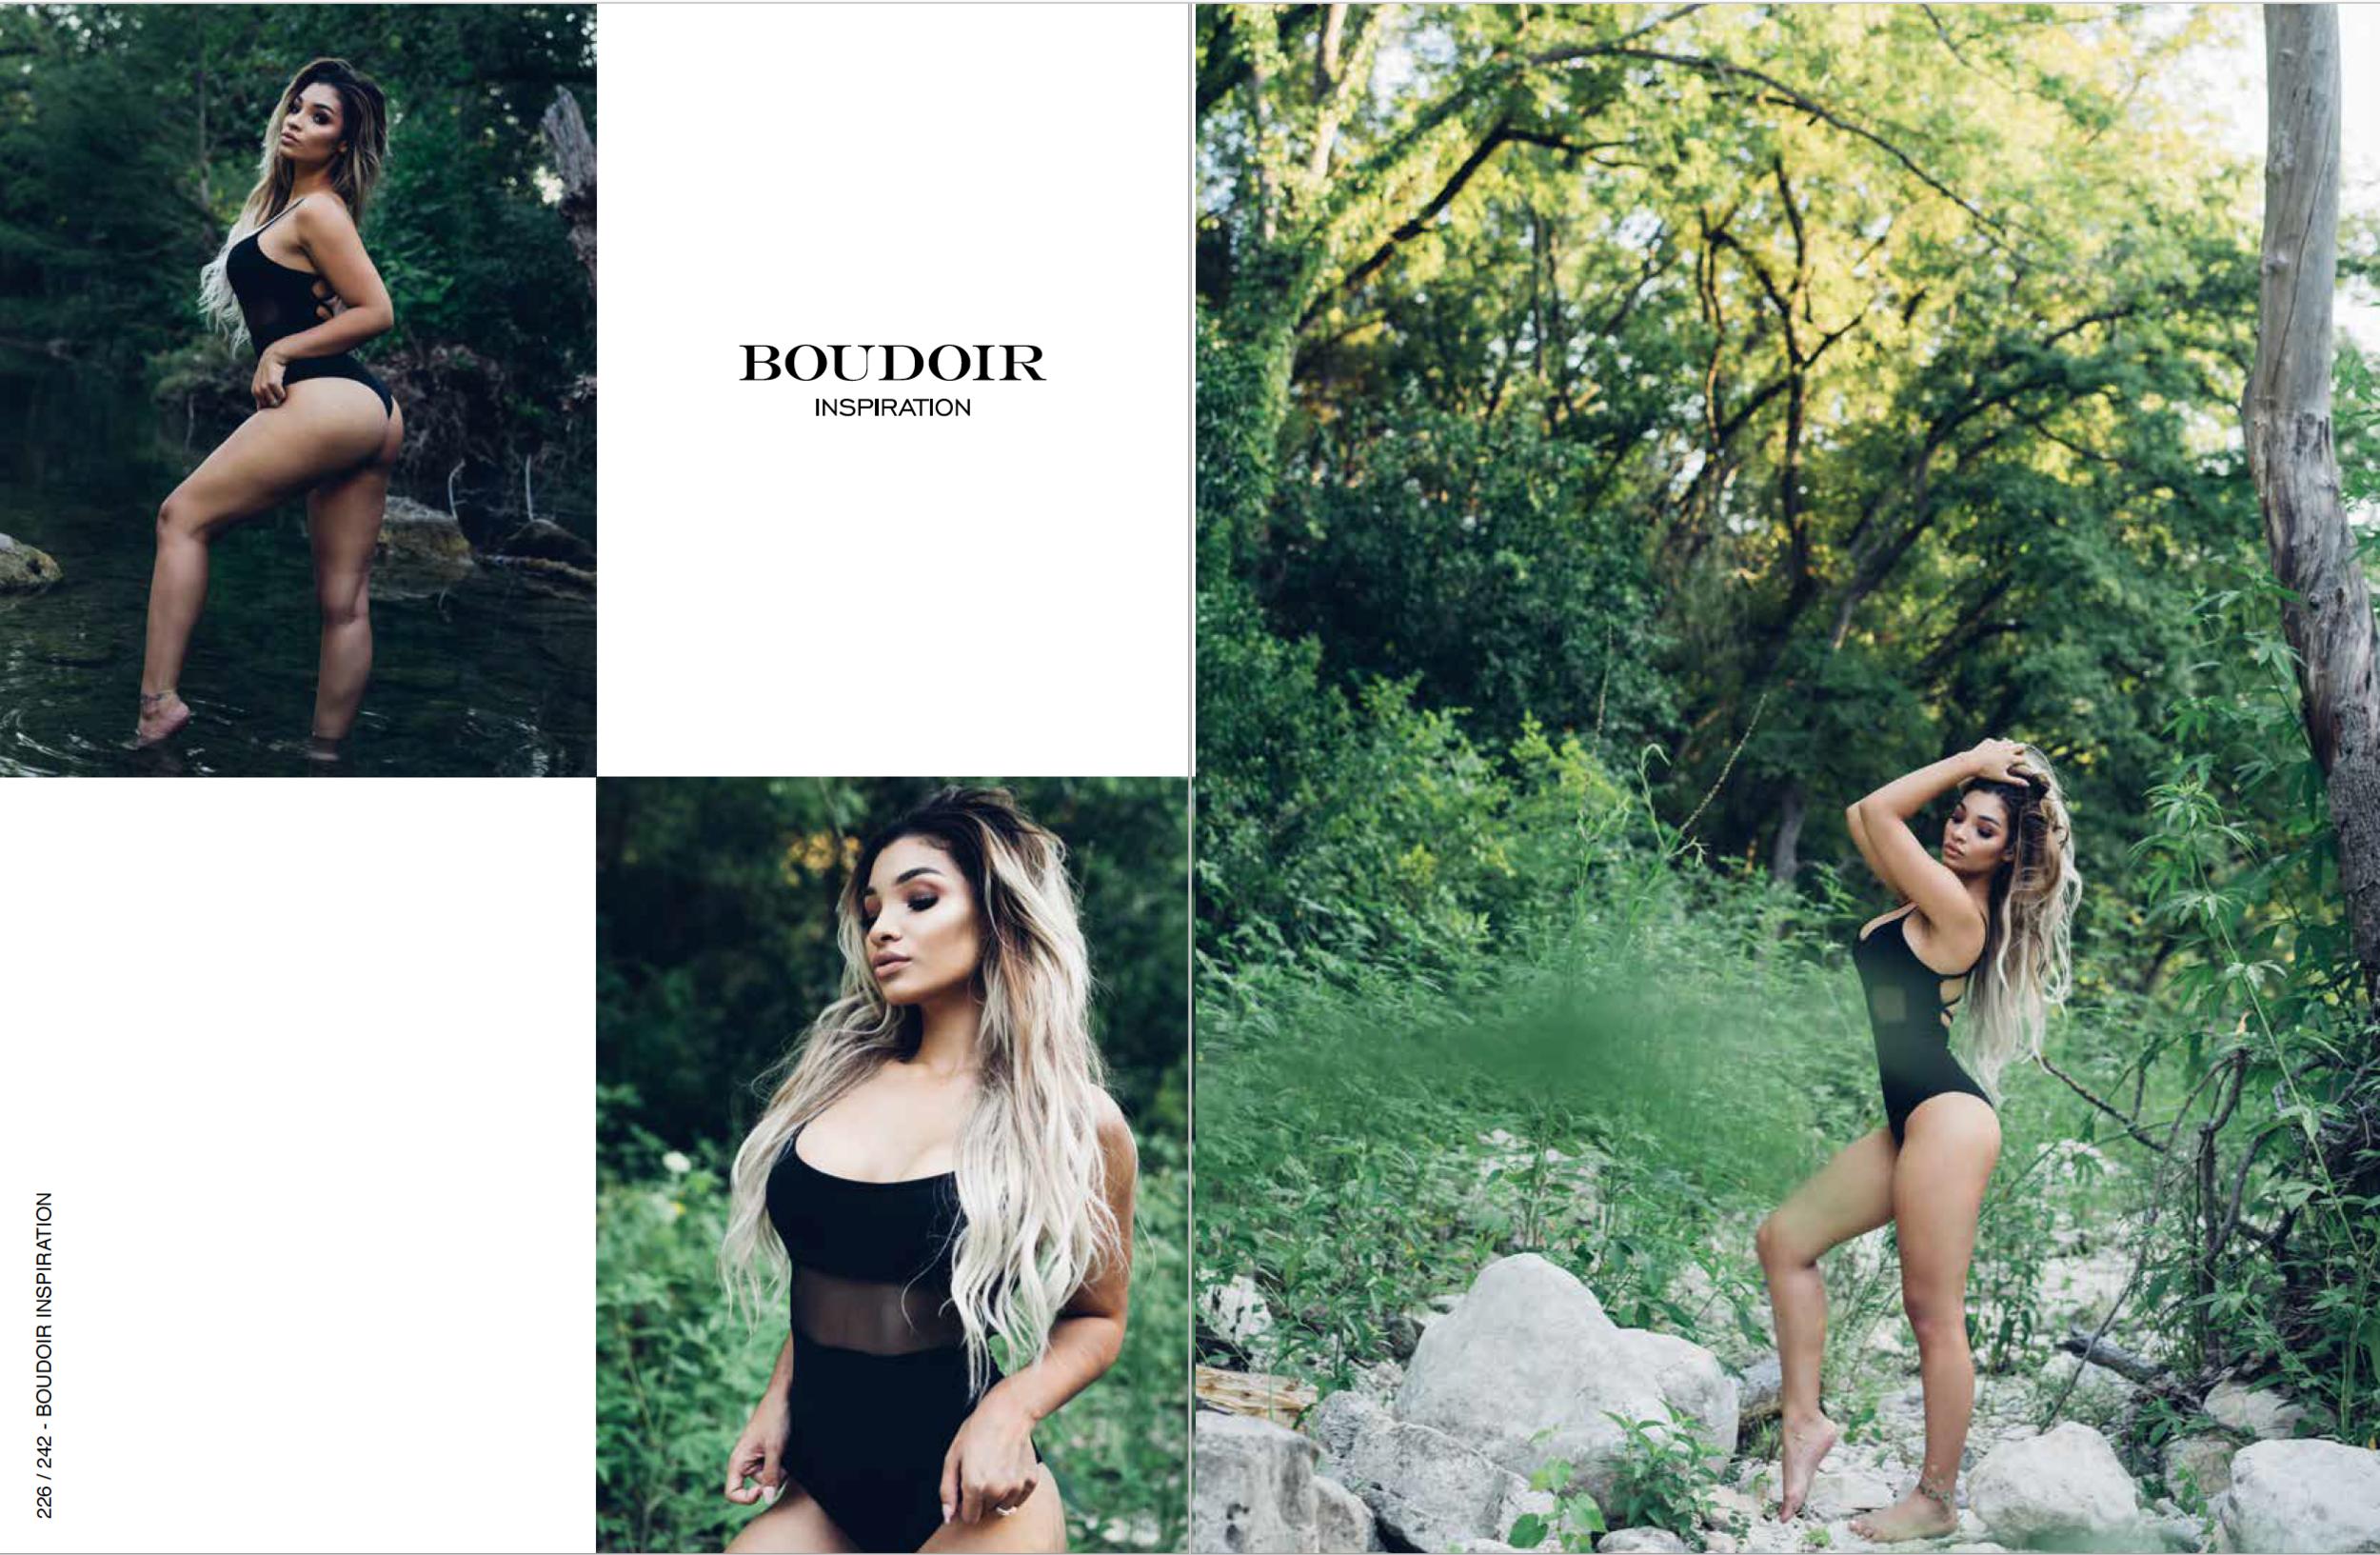 Boudoir Inspiration Magazine